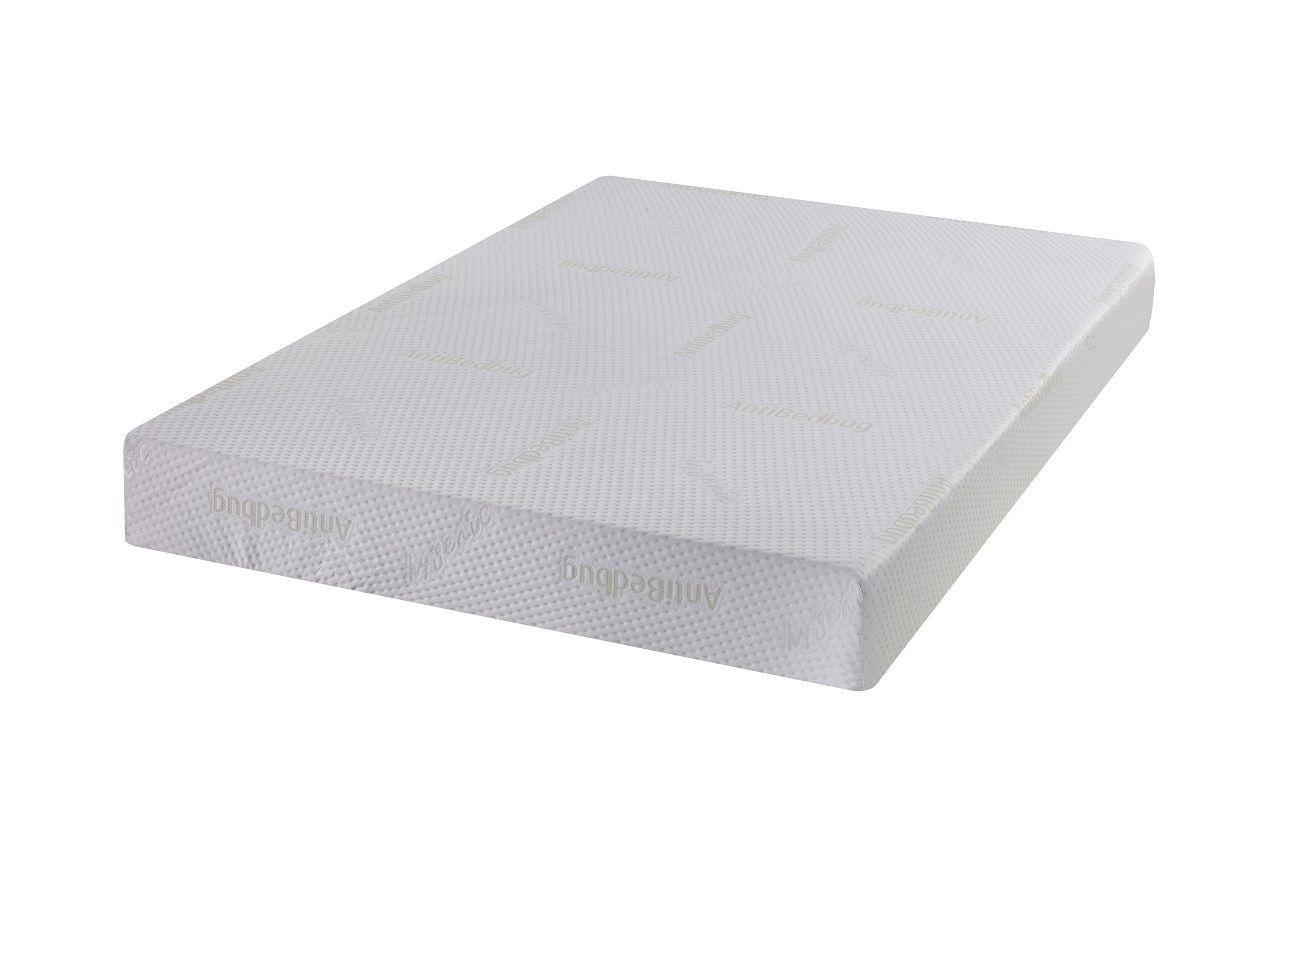 Maxitex Reve Anti Bed Bug Memory Foam Mattress